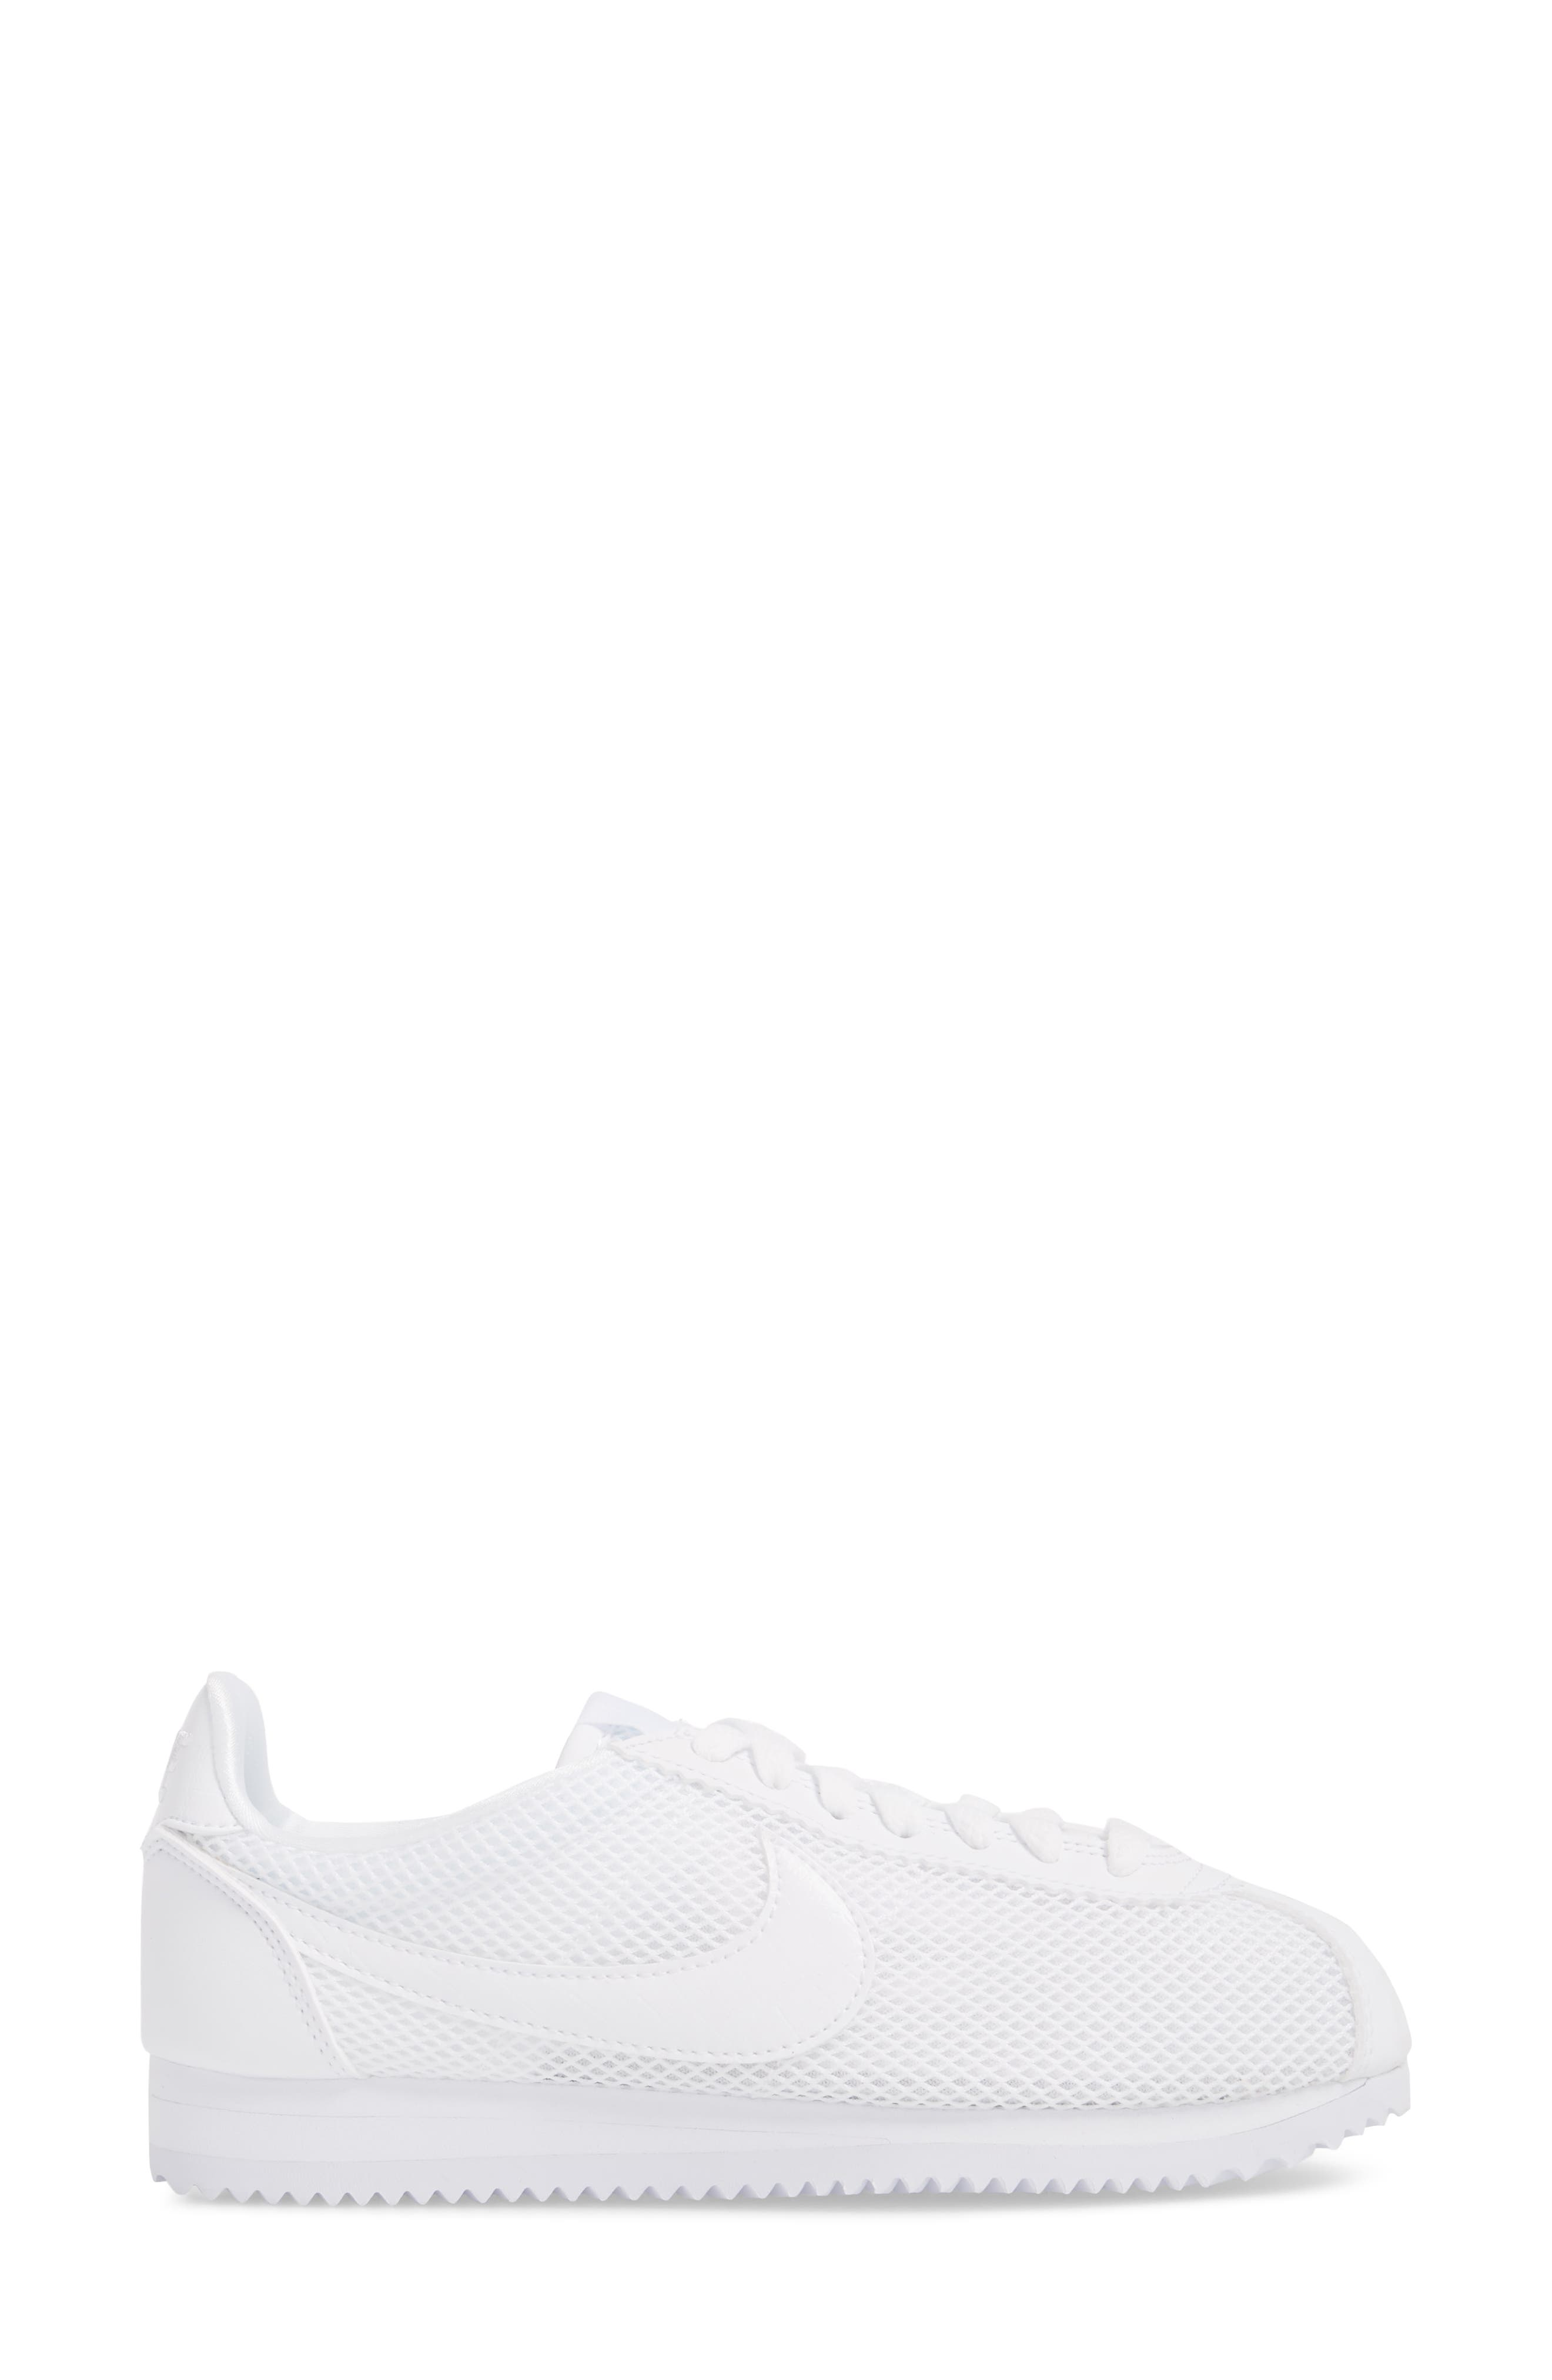 Classic Cortez Premium XLV Sneaker,                             Alternate thumbnail 3, color,                             White/ White